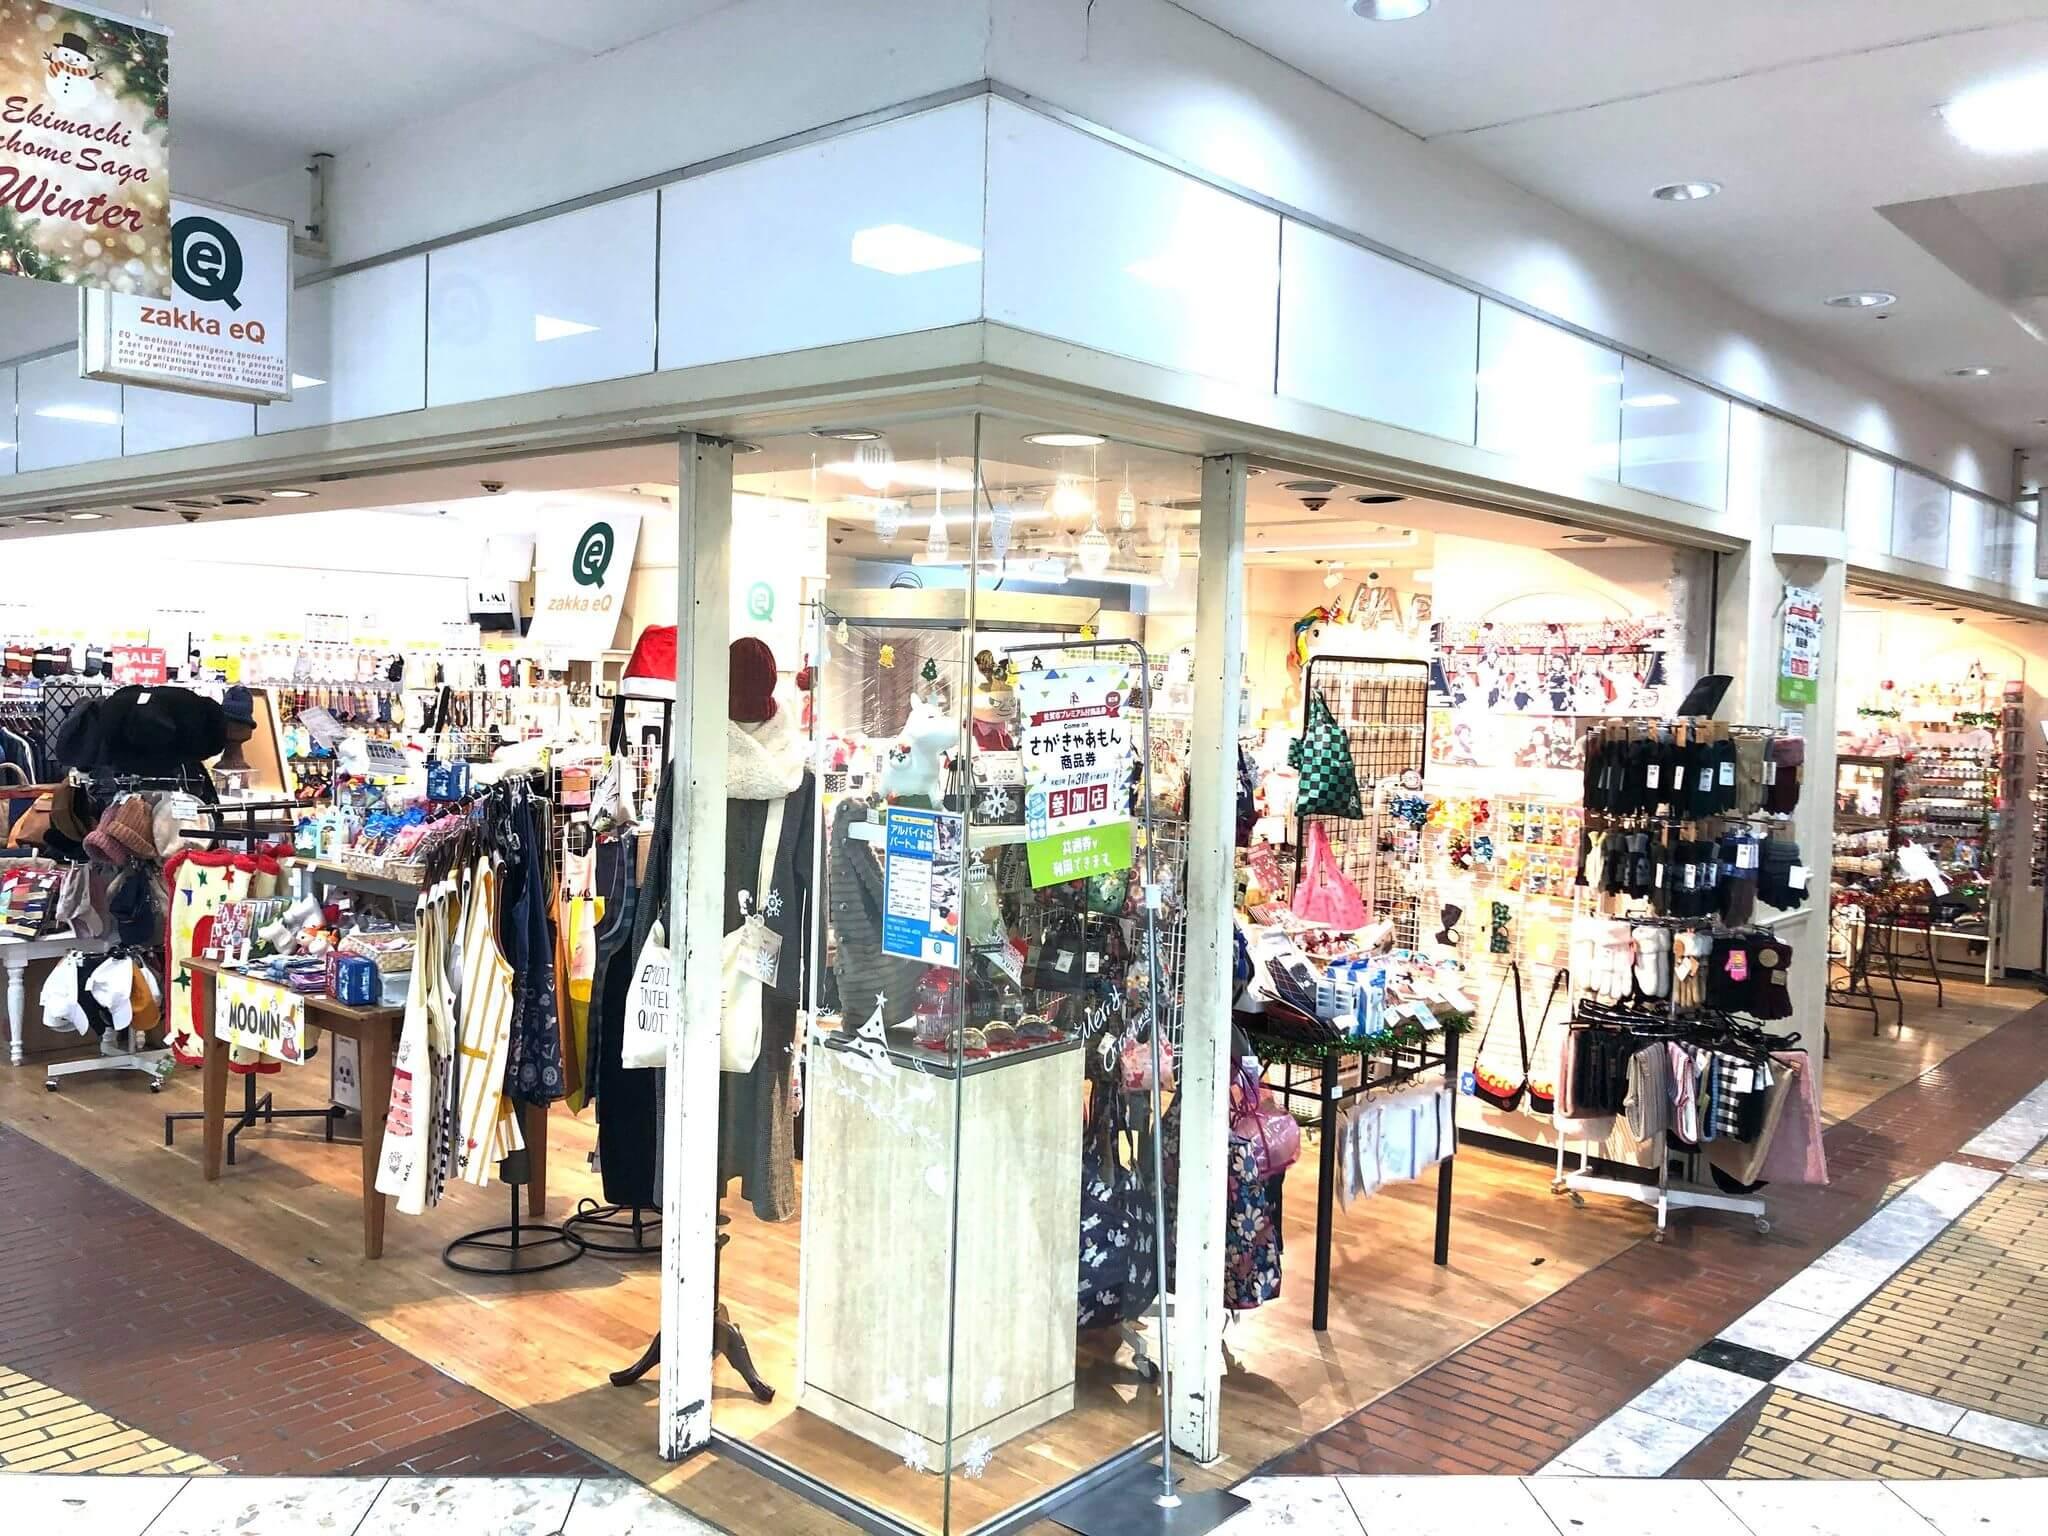 zakka eQ えきマチ1丁目佐賀店